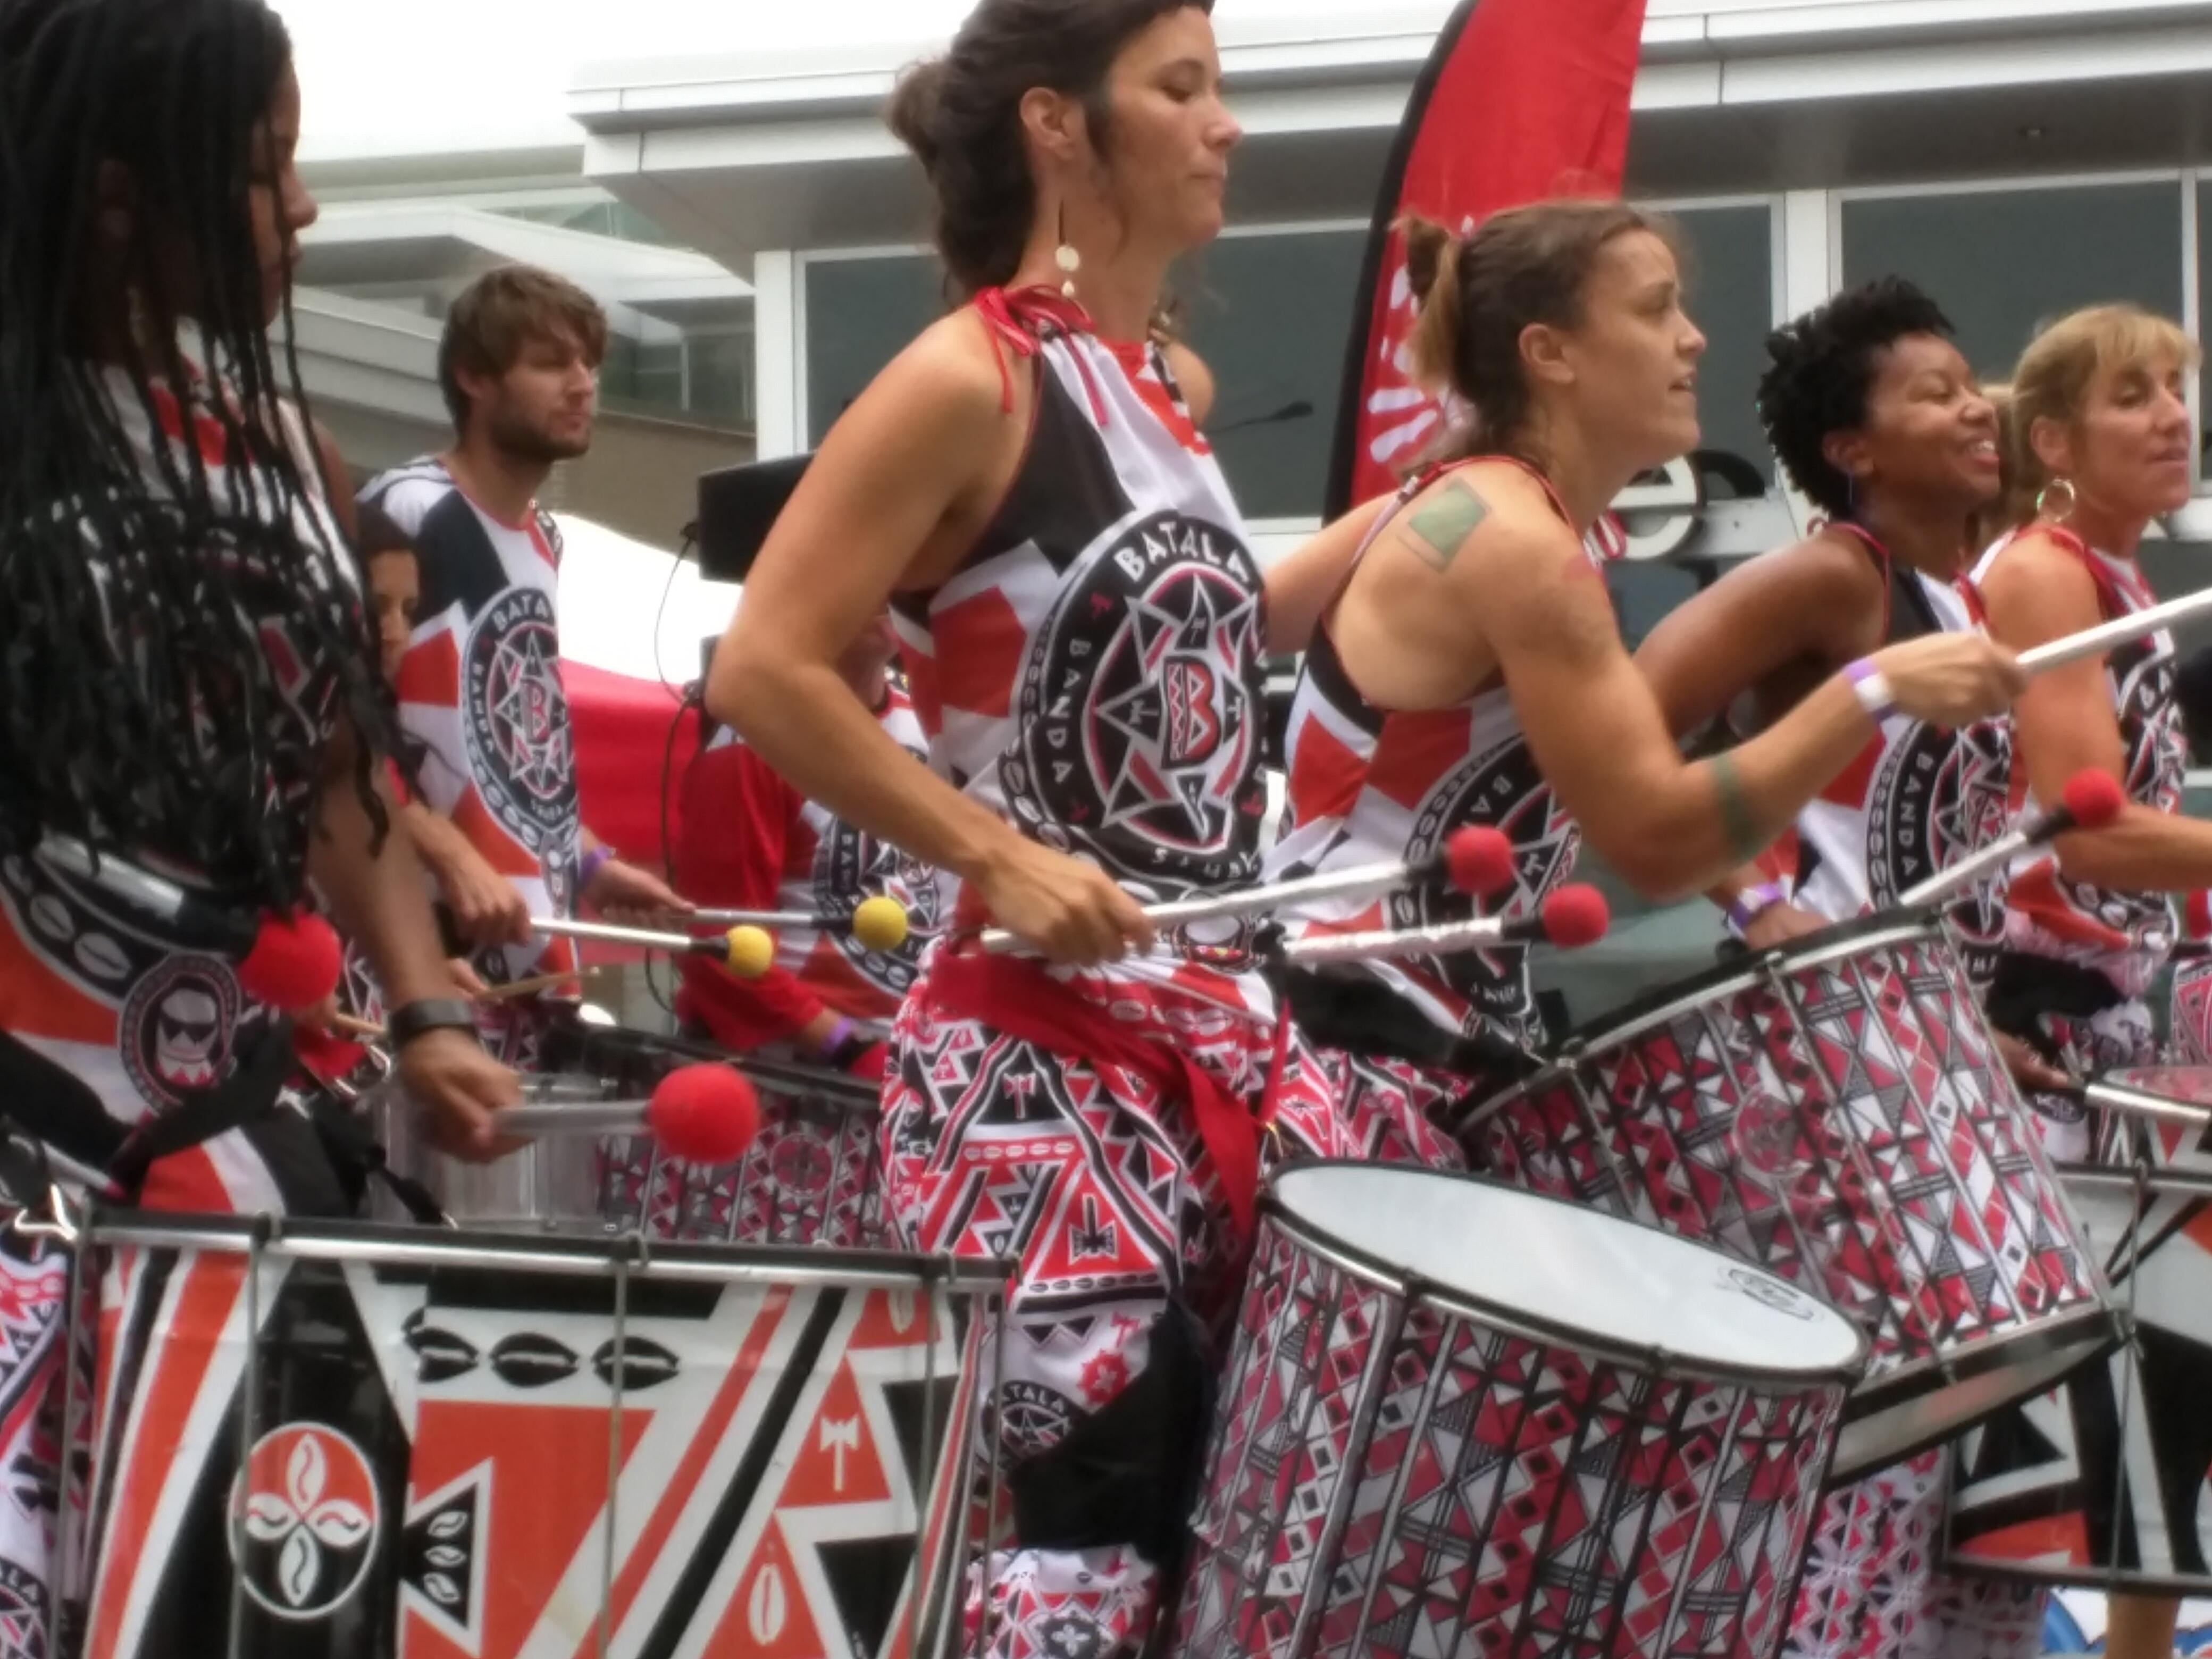 Batala Durham @ Fiesta del Pueblo - Sept 25th, 2016